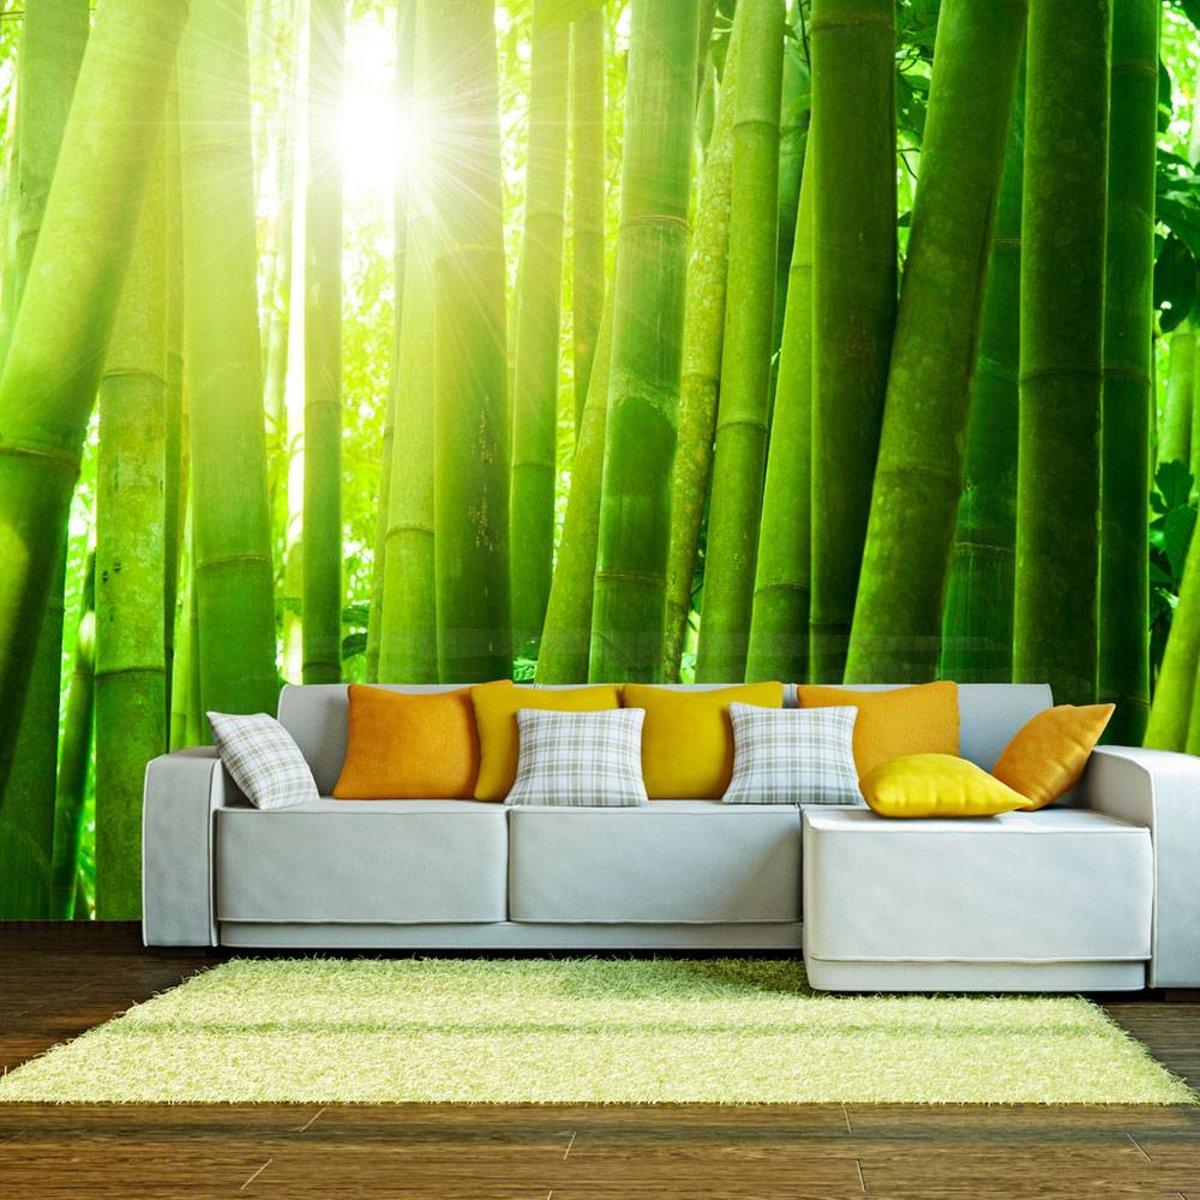 Fotobehang - Zon en bamboe - 400x309